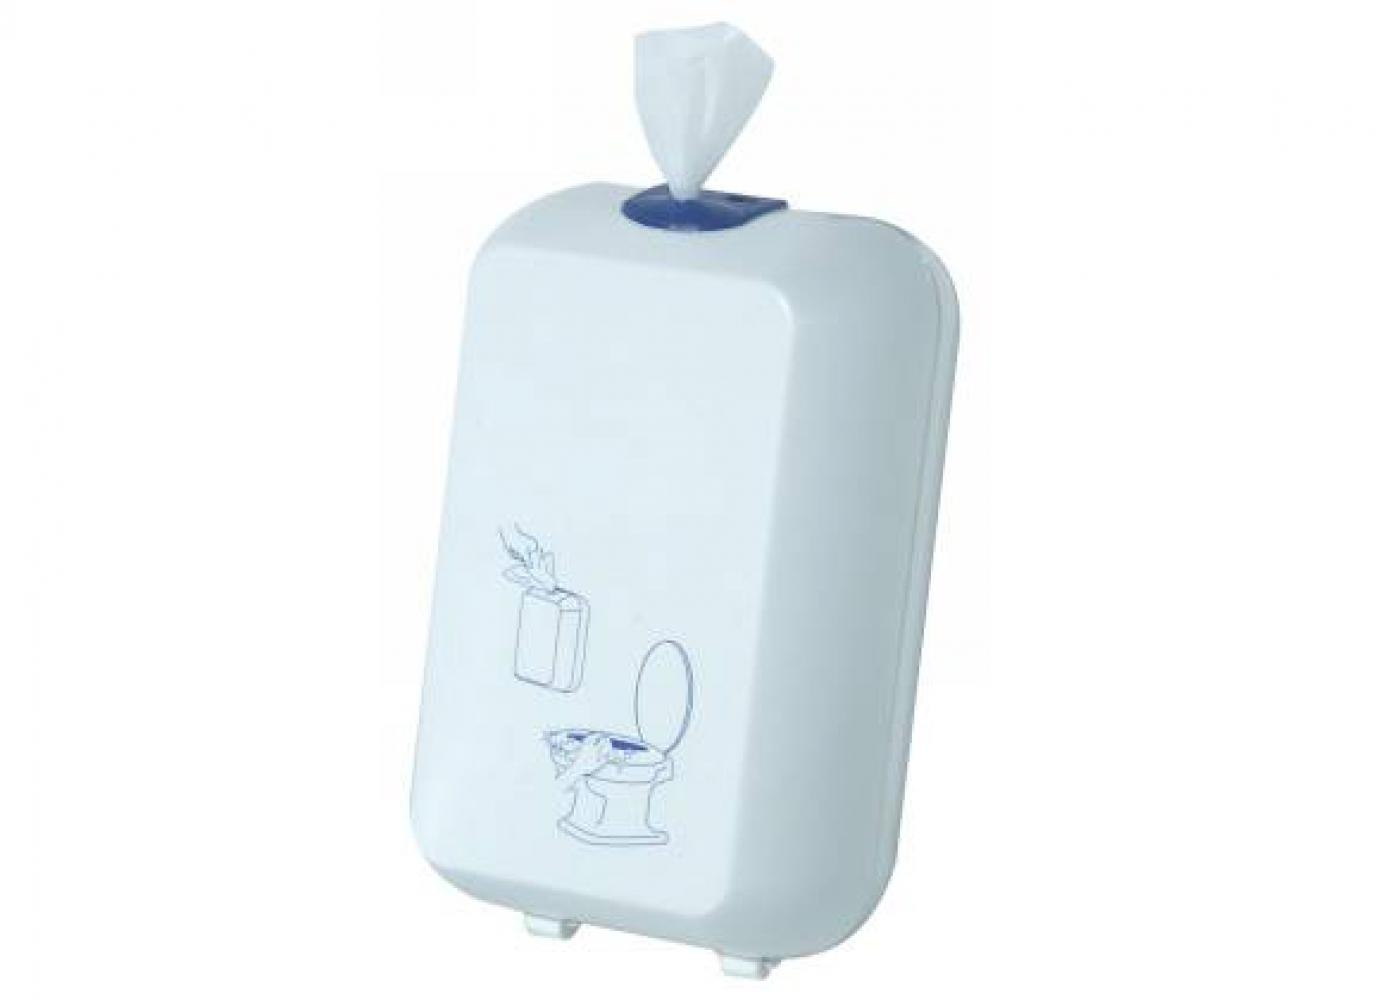 Acquista Distributore Salviette Igienizzanti 17545684 | Glooke.com